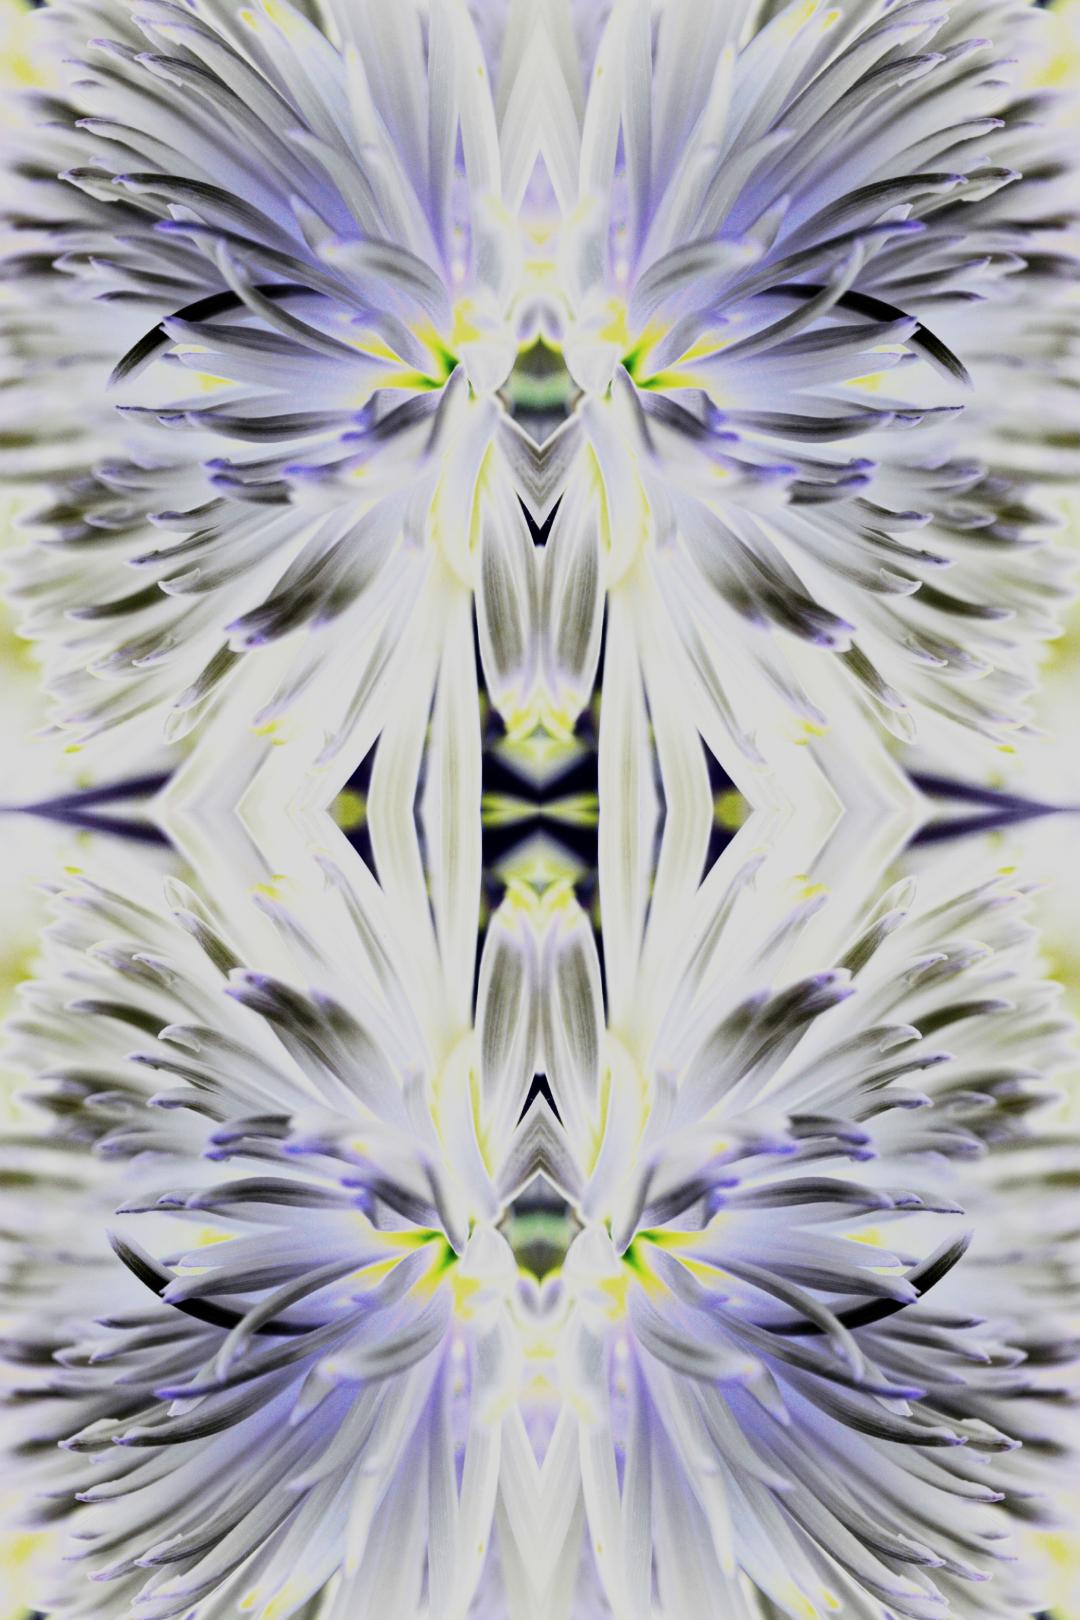 Chrysanthemum Vivid Glow